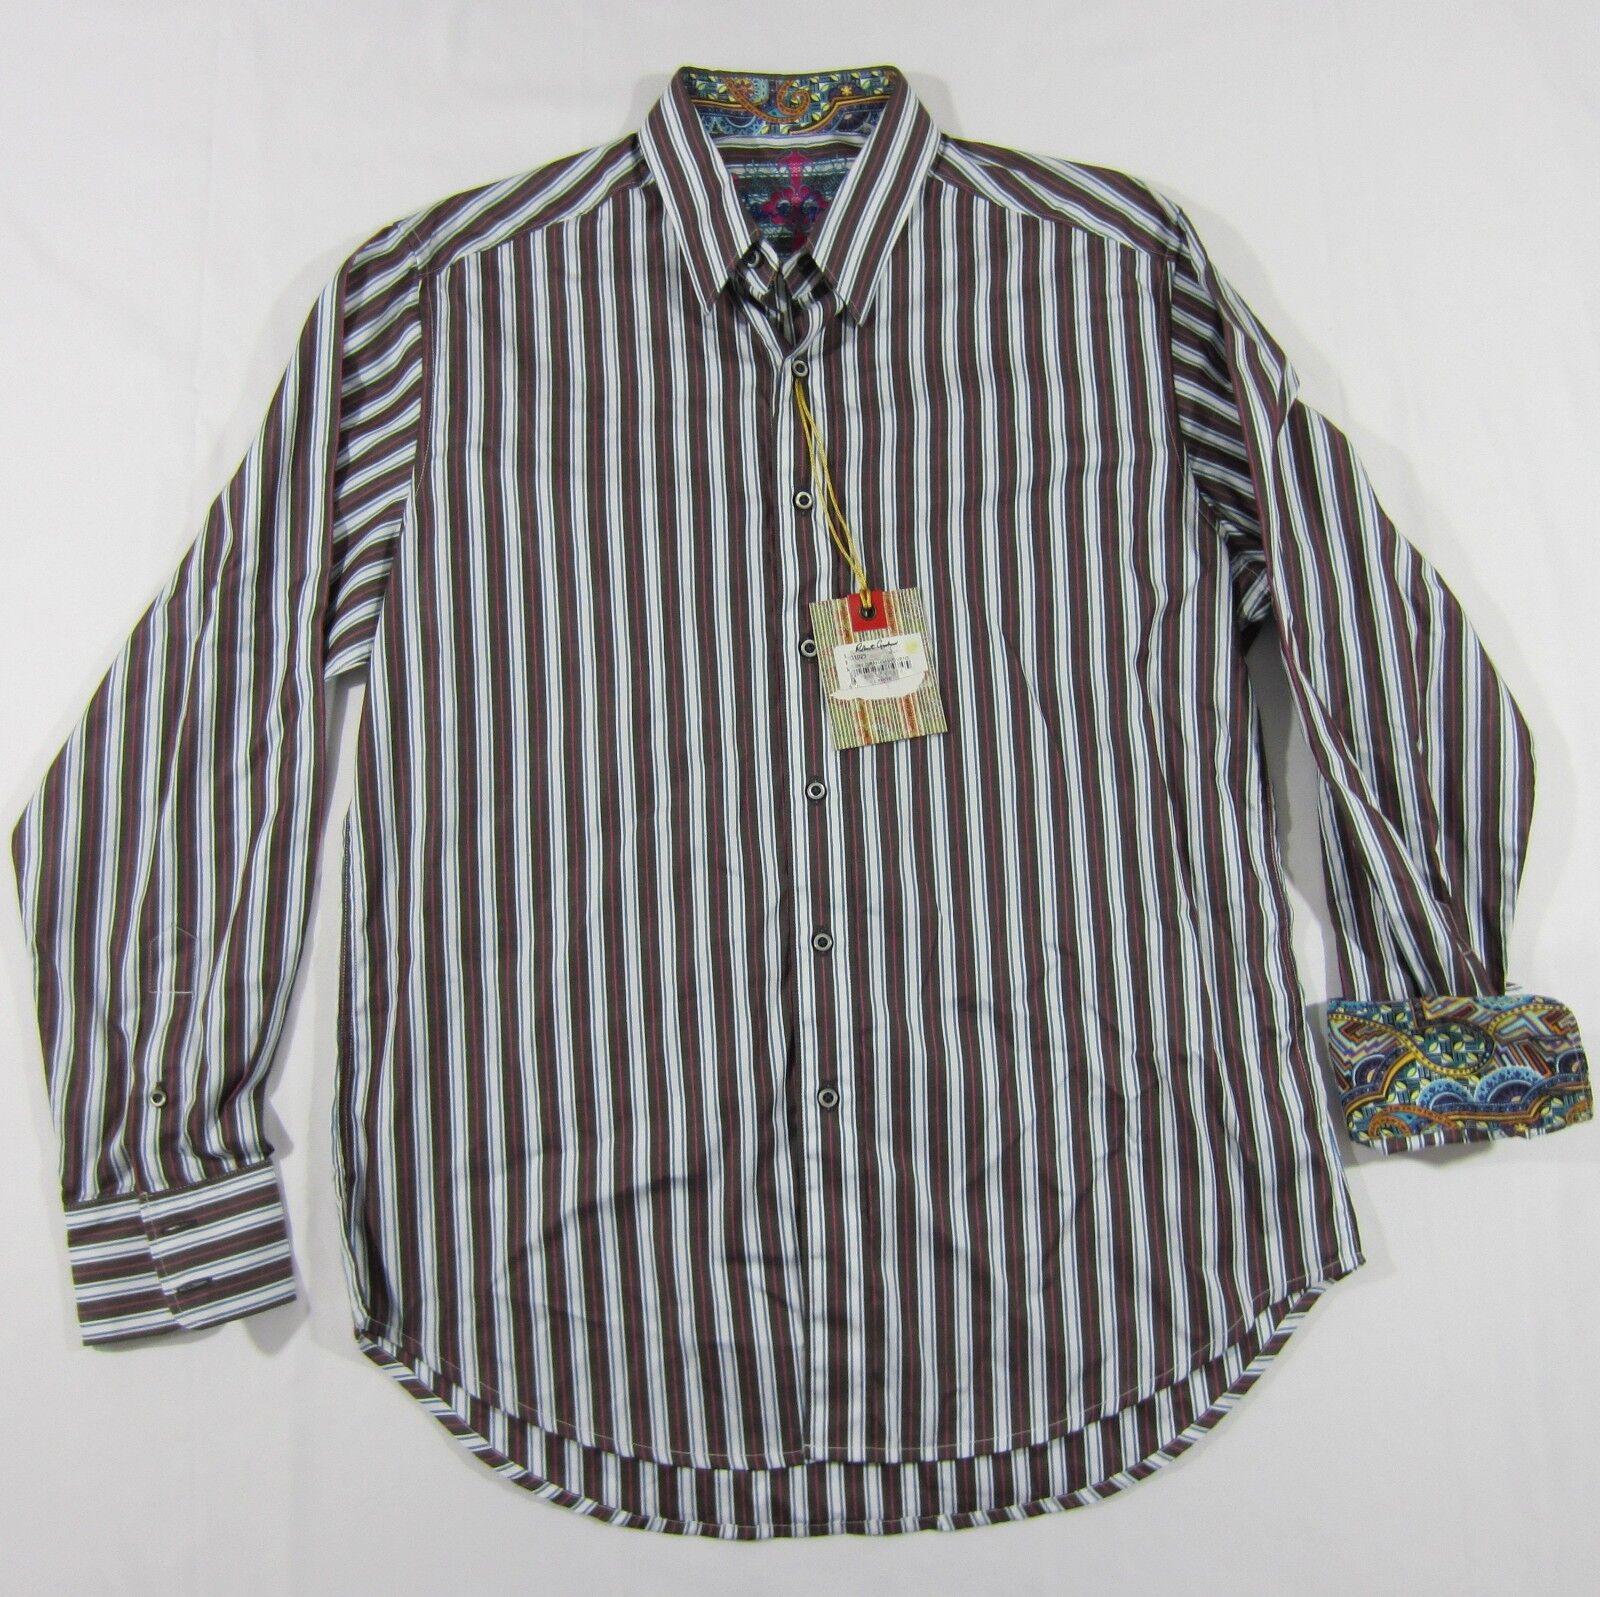 ROBERT GRAHAM Men's Multicolord Striped Button Up Dress Shirt Sz M NWT